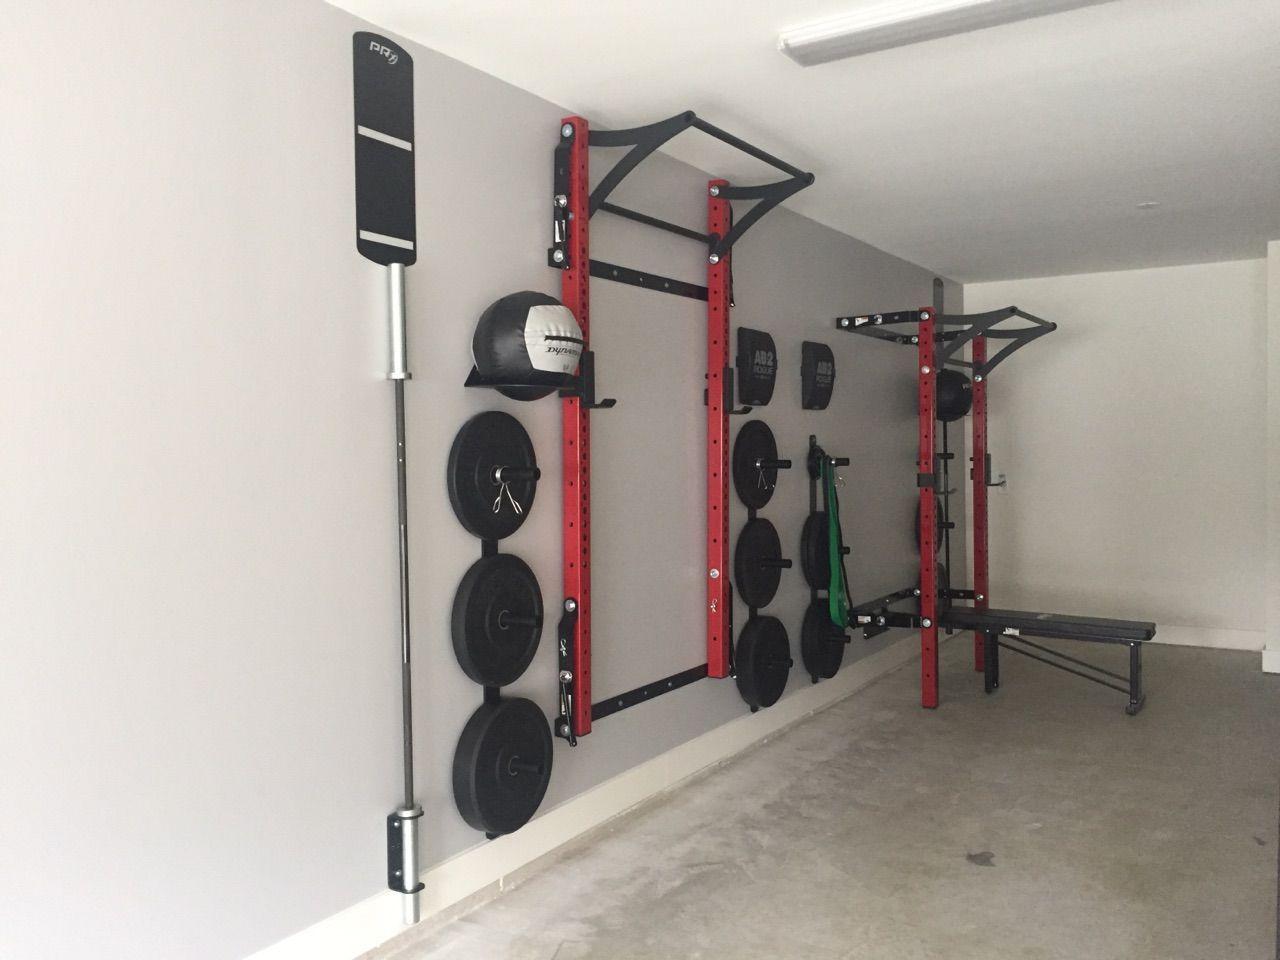 His hers space saving squat racks garage gym in